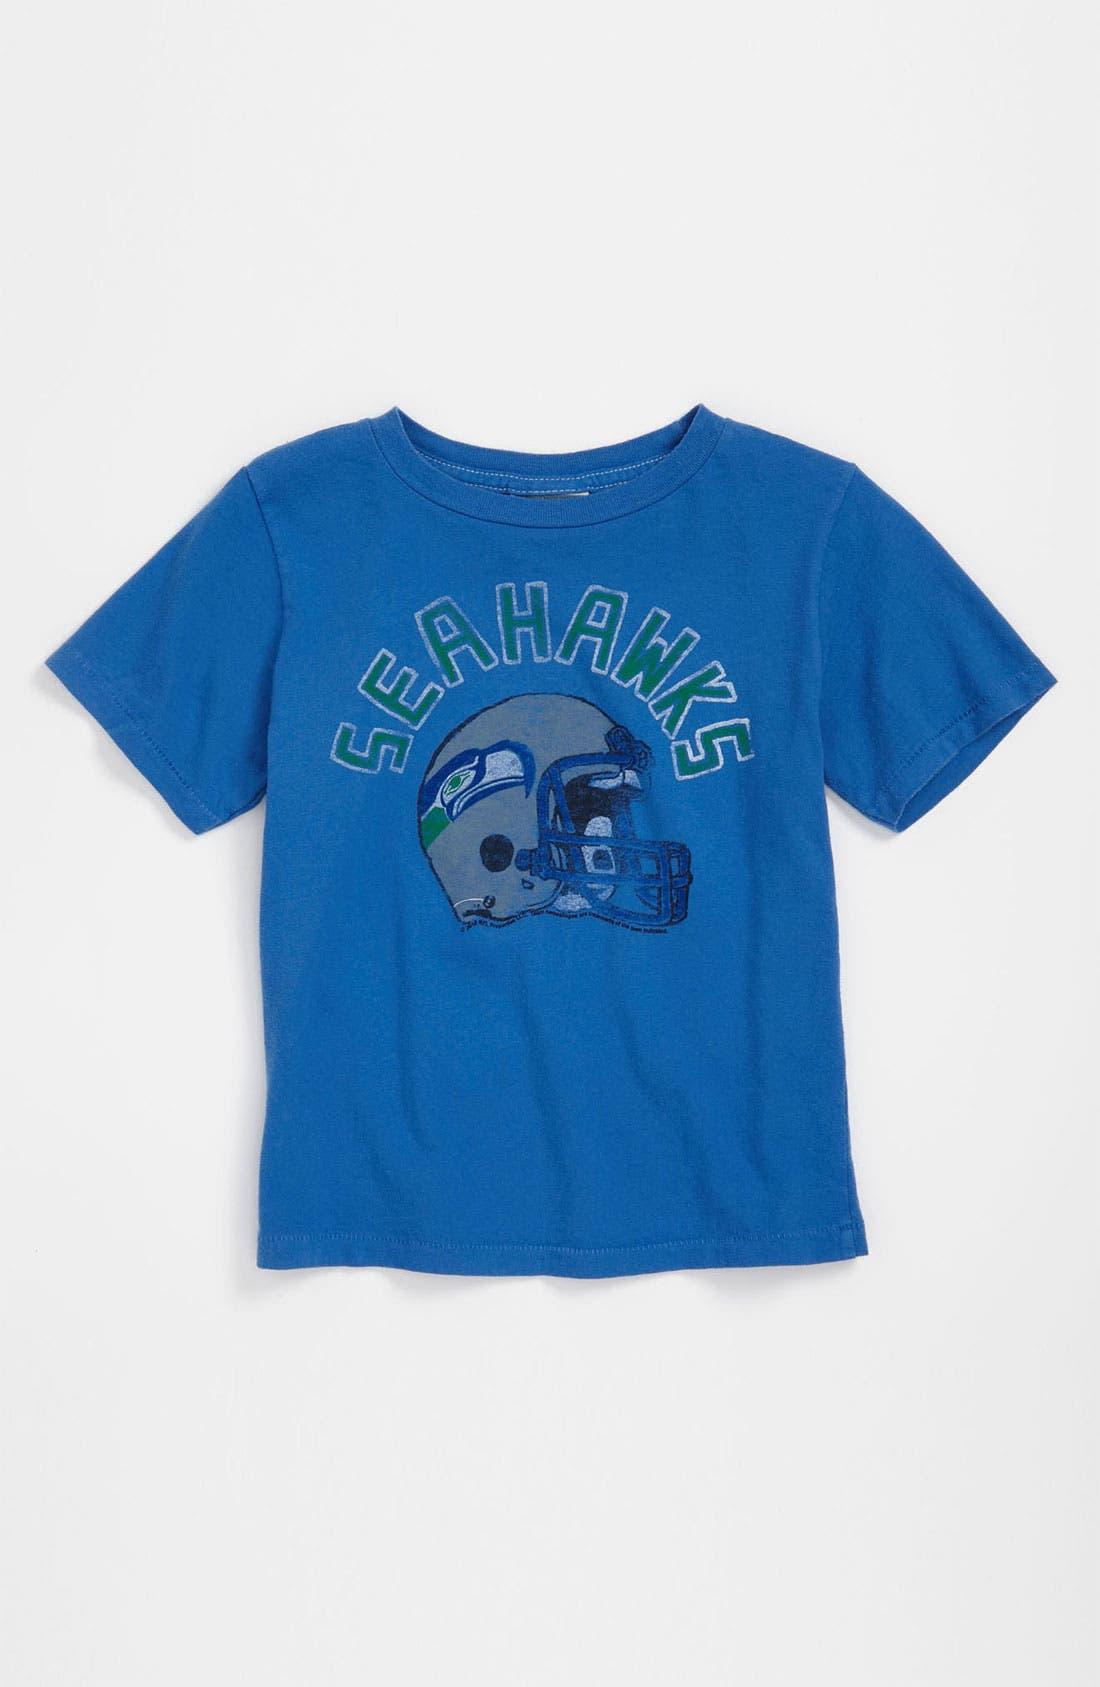 Alternate Image 1 Selected - Junk Food 'Seattle Seahawks' T-Shirt (Toddler)